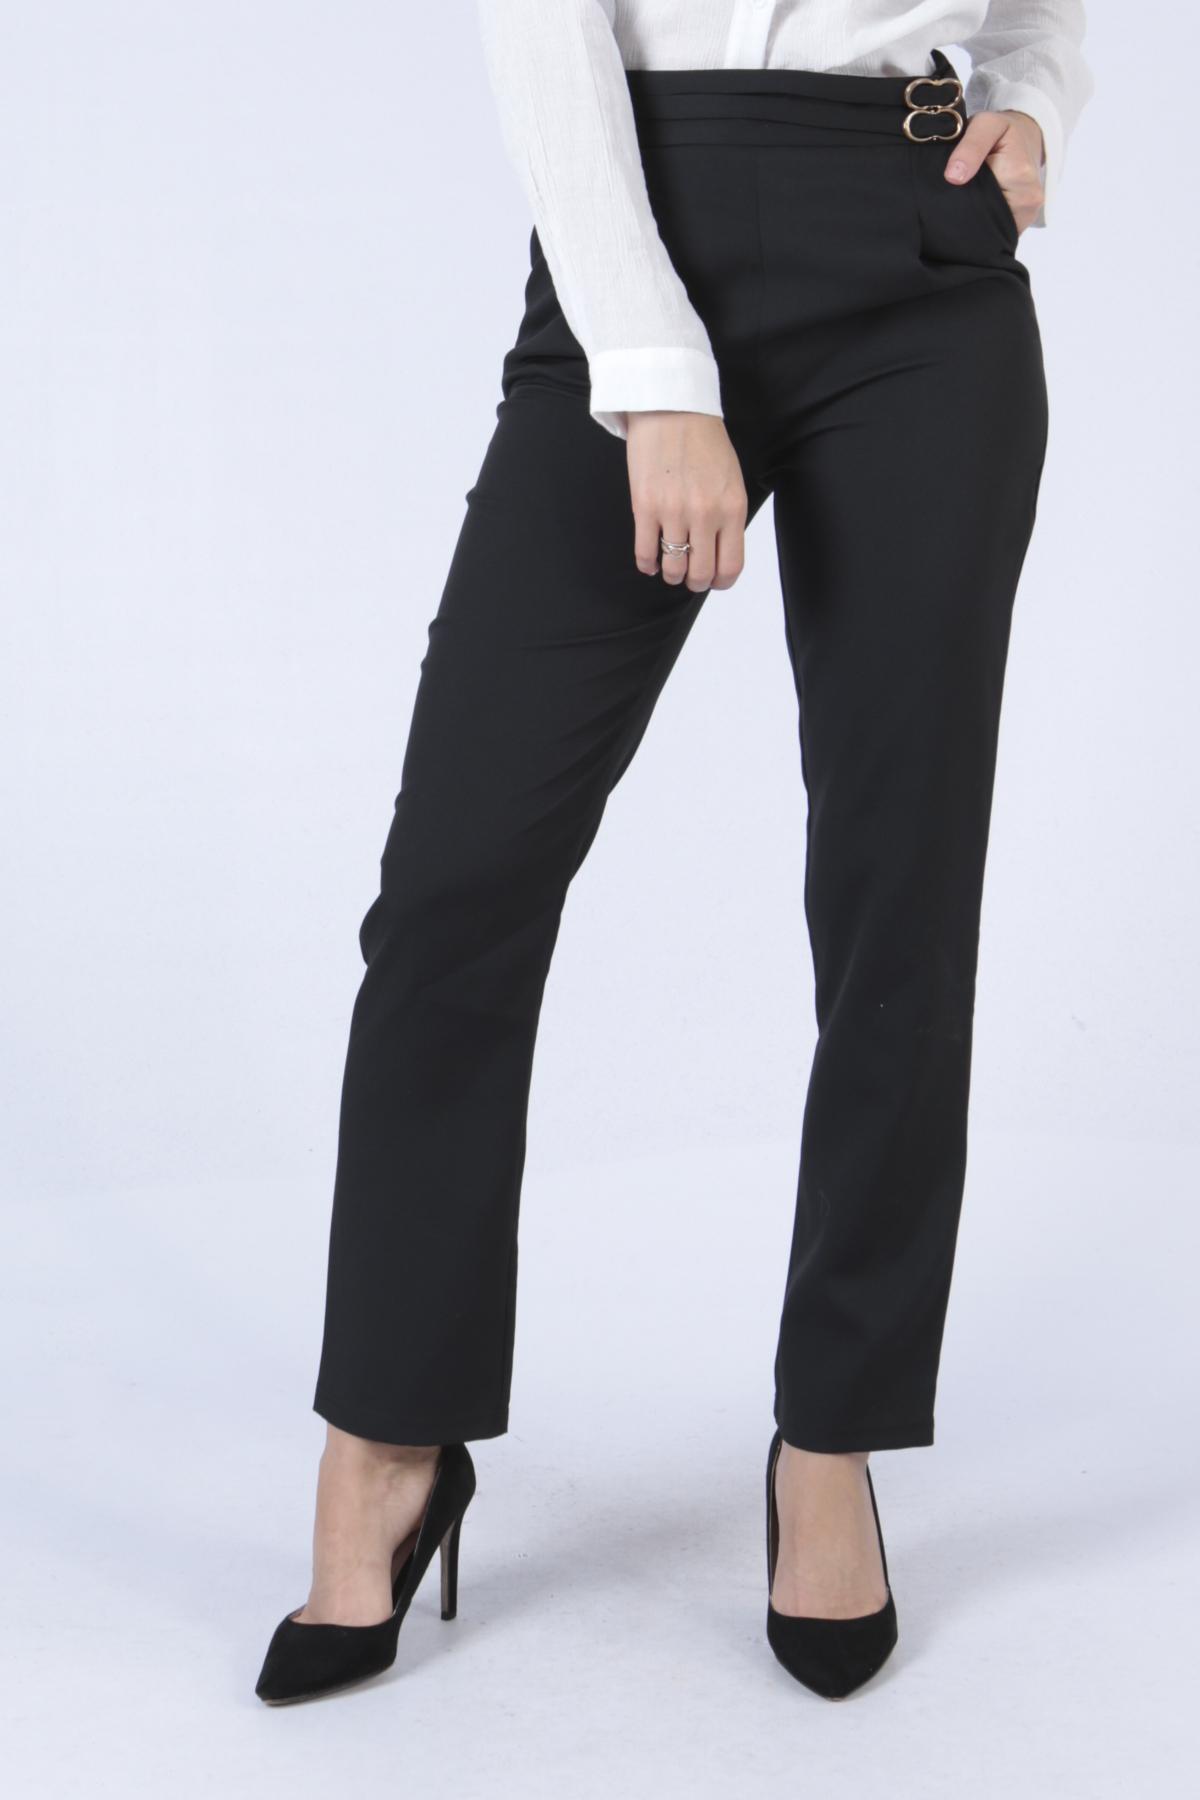 Pantalons Femme 8013-NOIR Sophyline